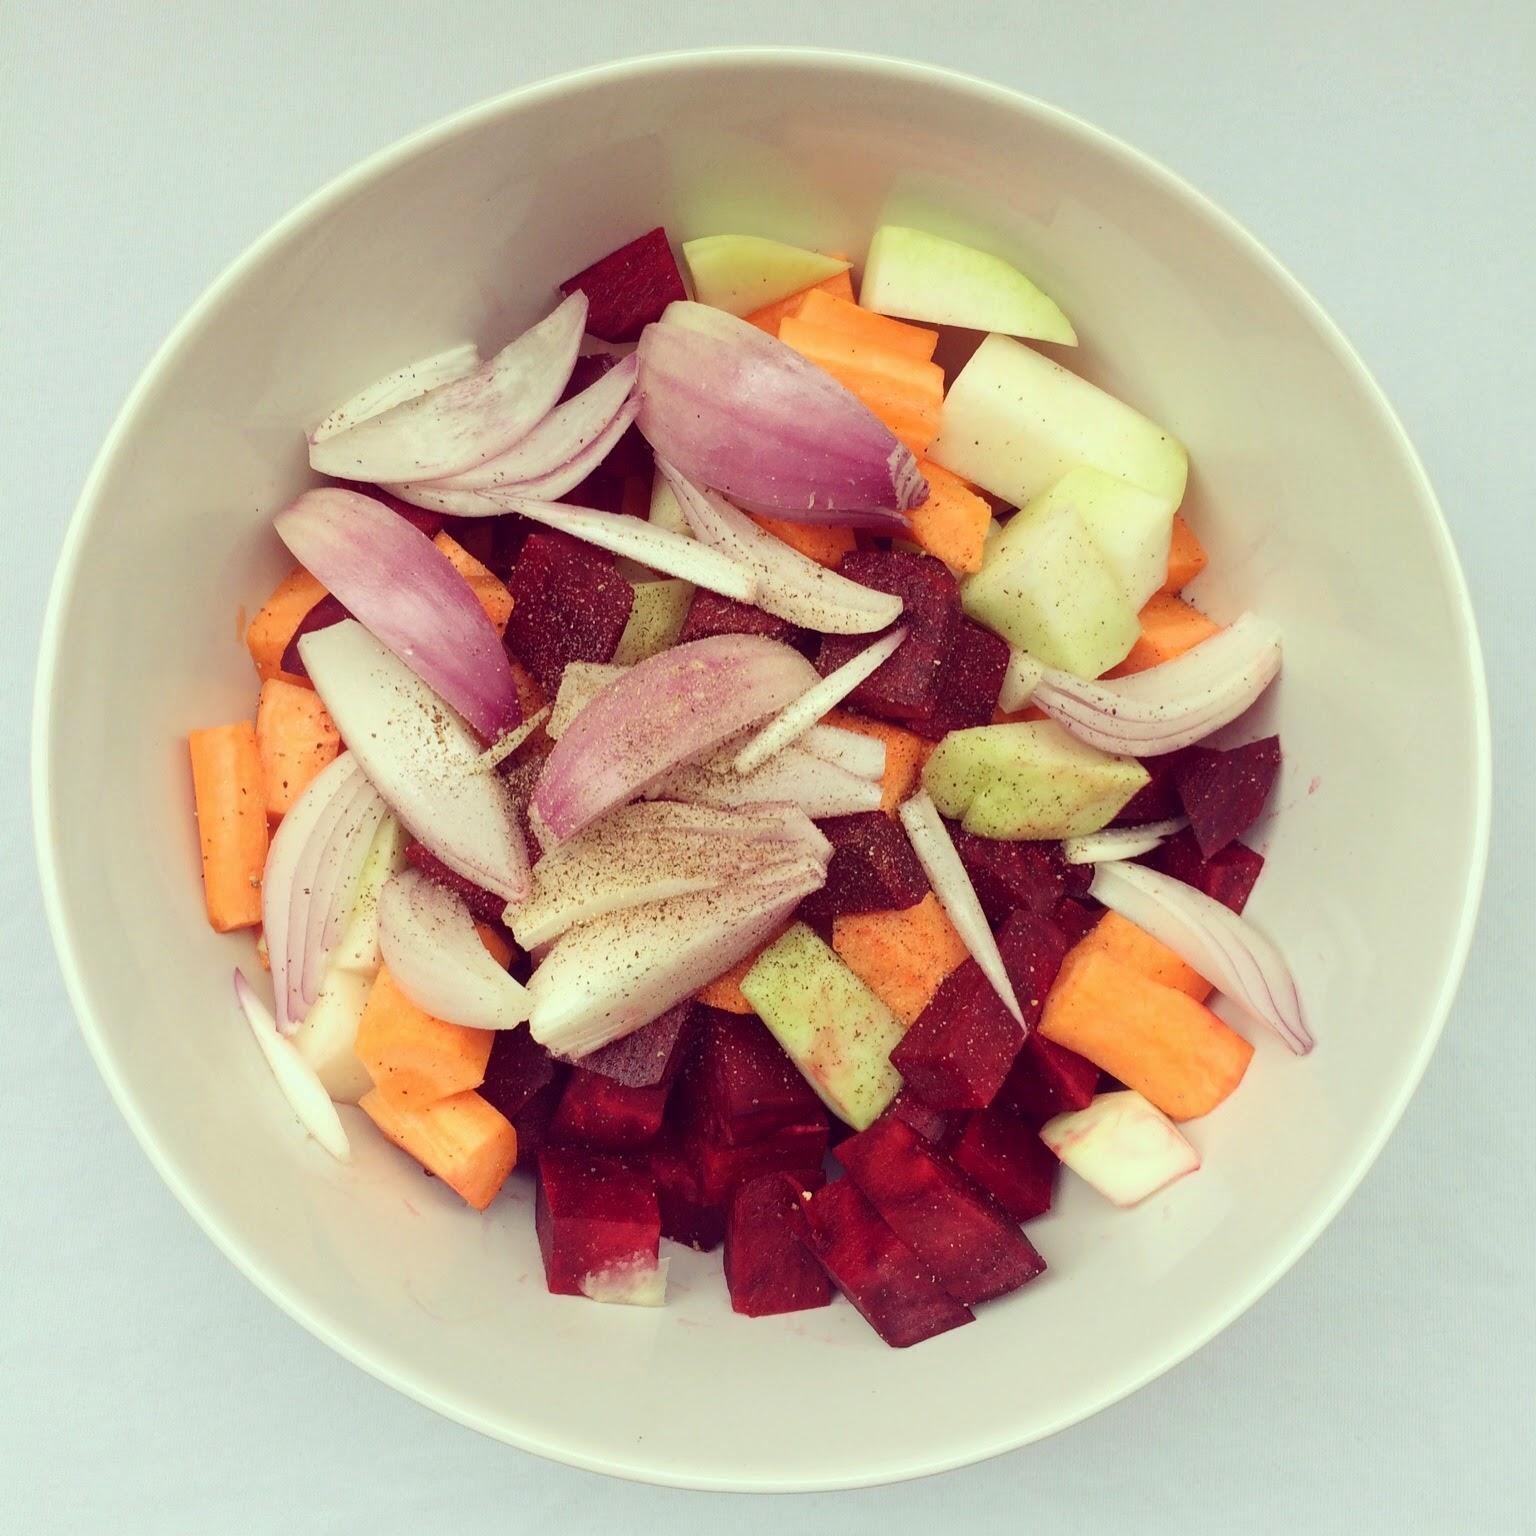 salade légumes racines à l'orange